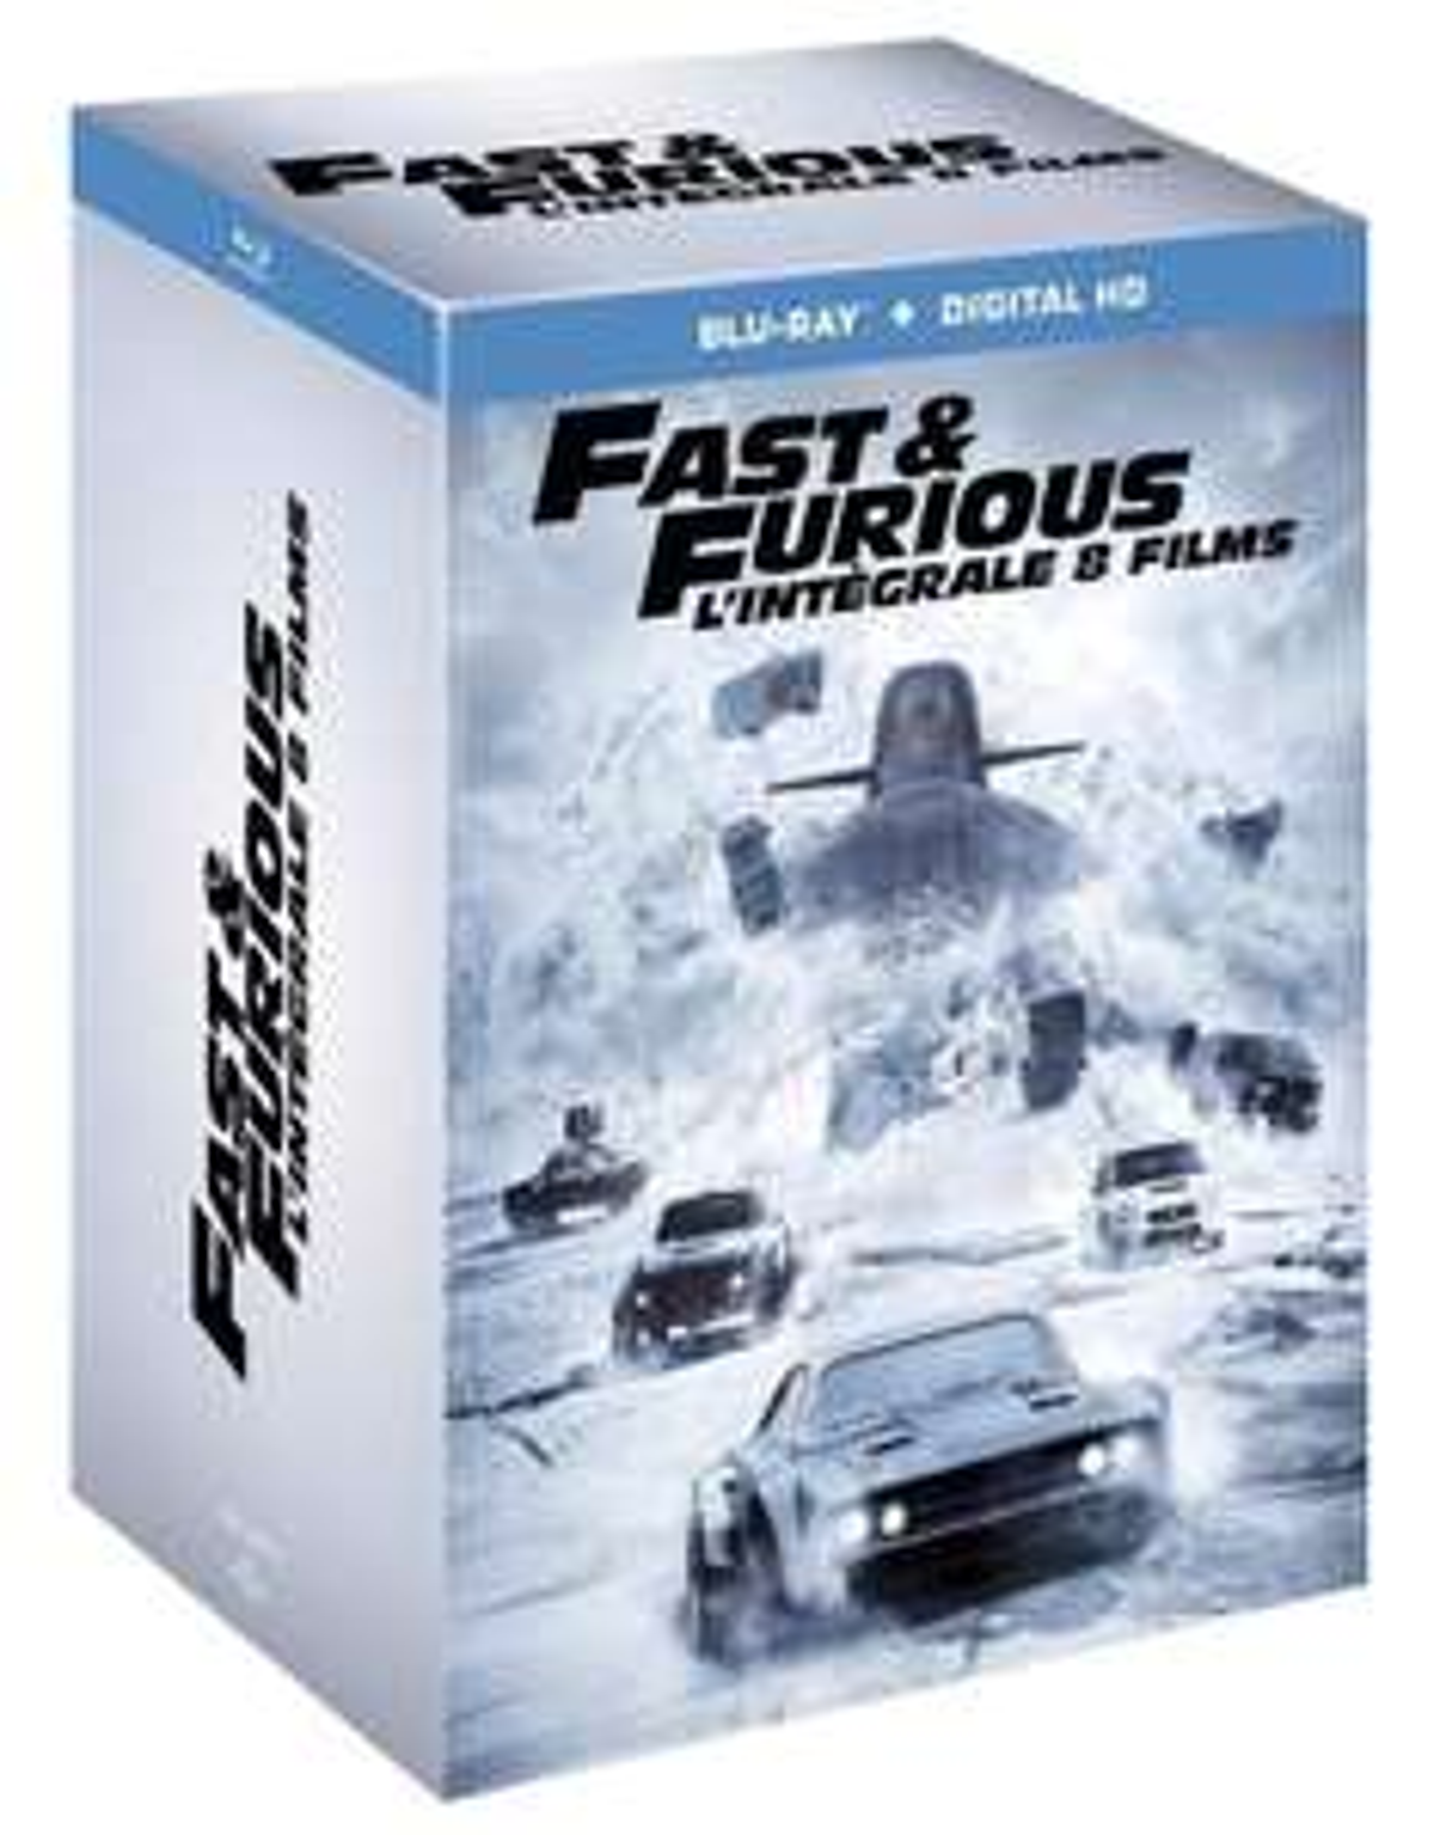 Coffret Blu-ray Fast and Furious - L'intégrale des 8 films